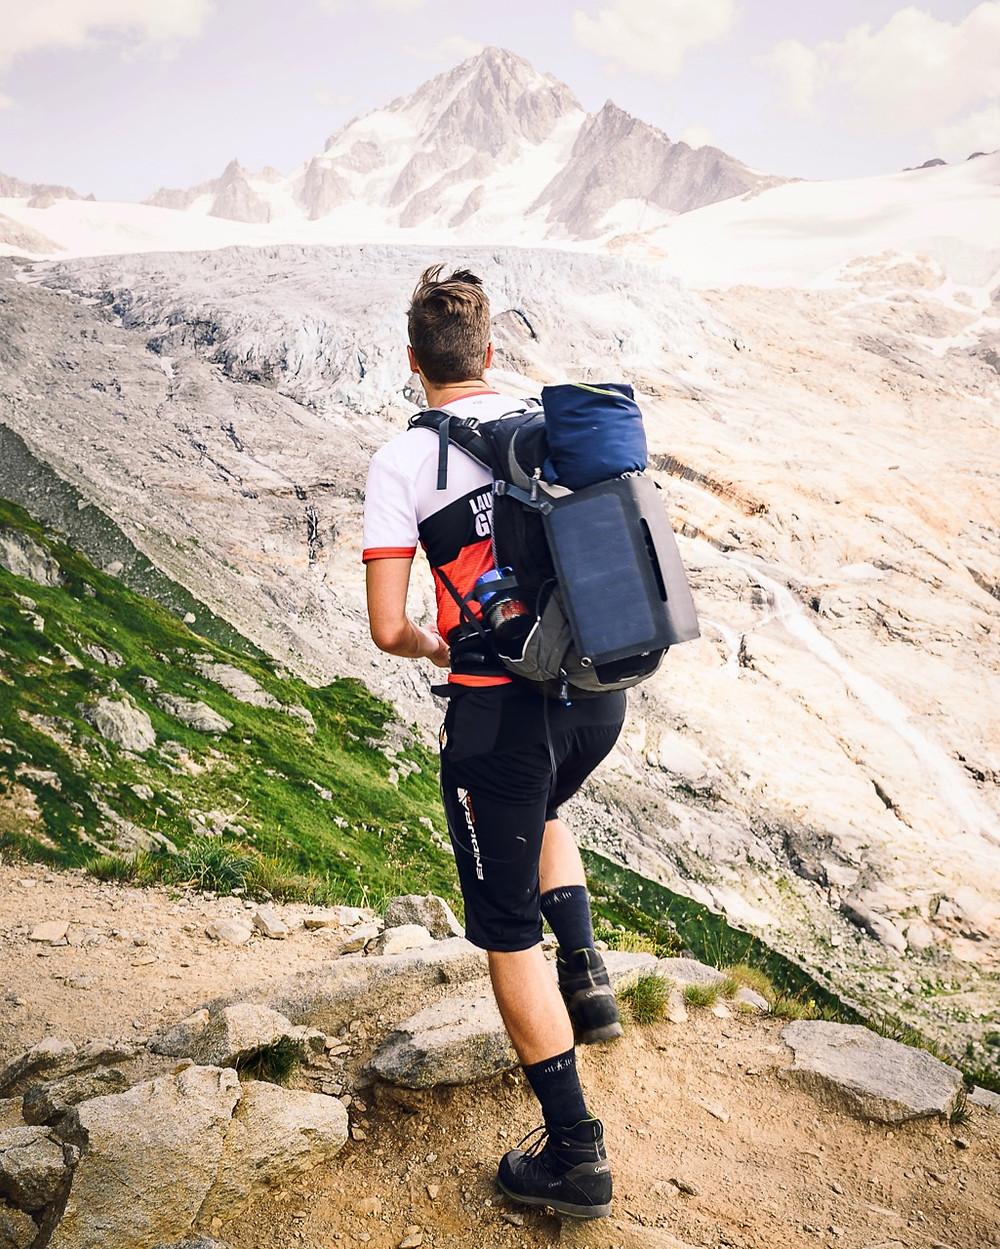 Adventure photographer @sebastianlhe hiking through the Alps with his Alto Solar Charger